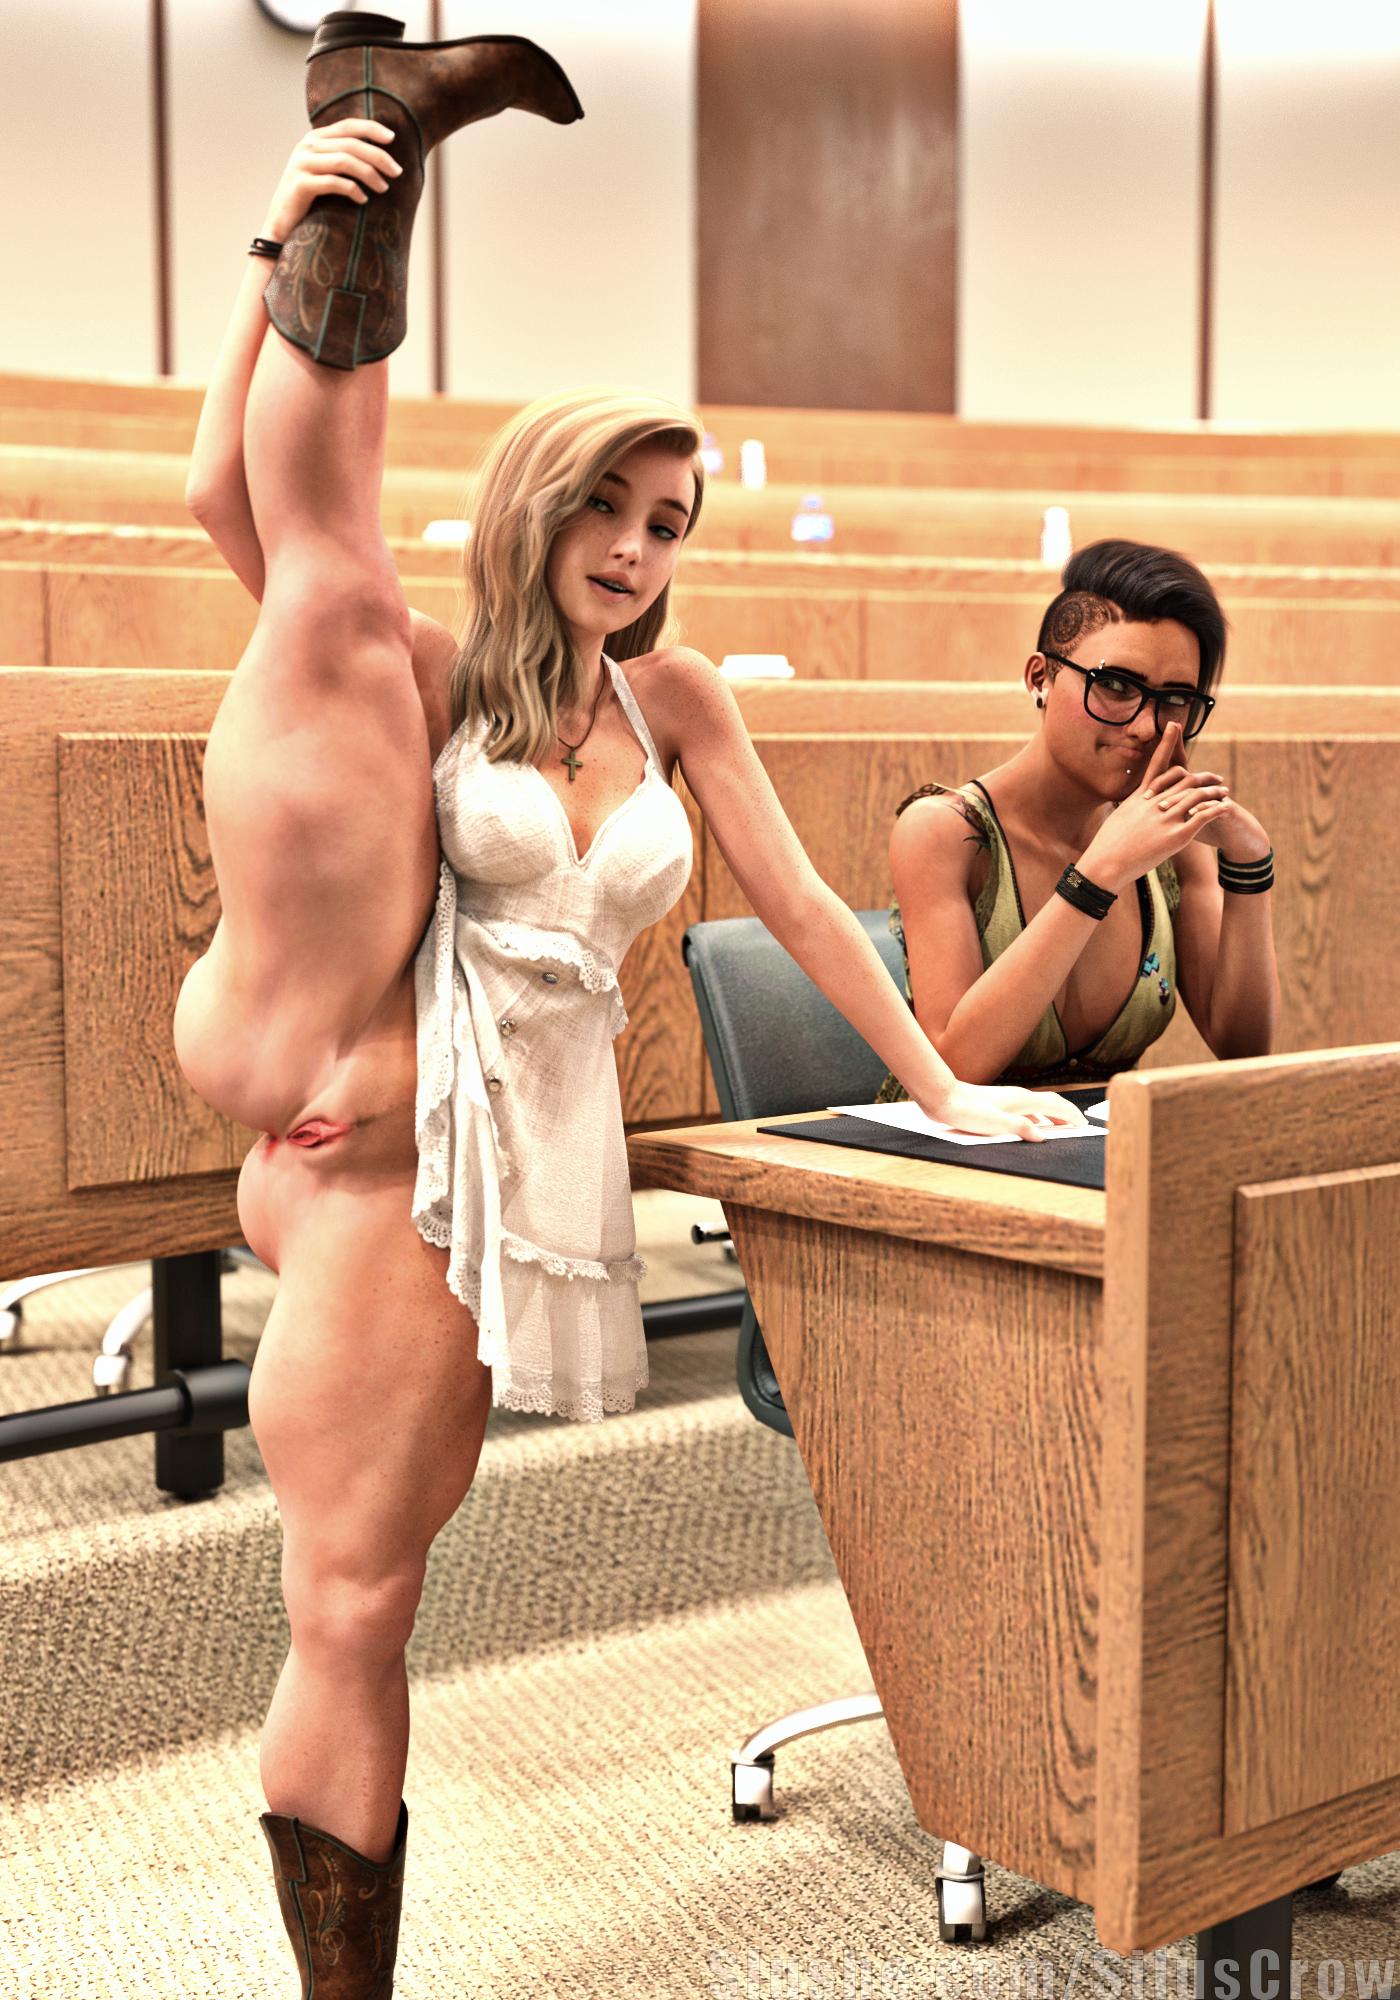 Charlotte & Robyn - A Leg Up